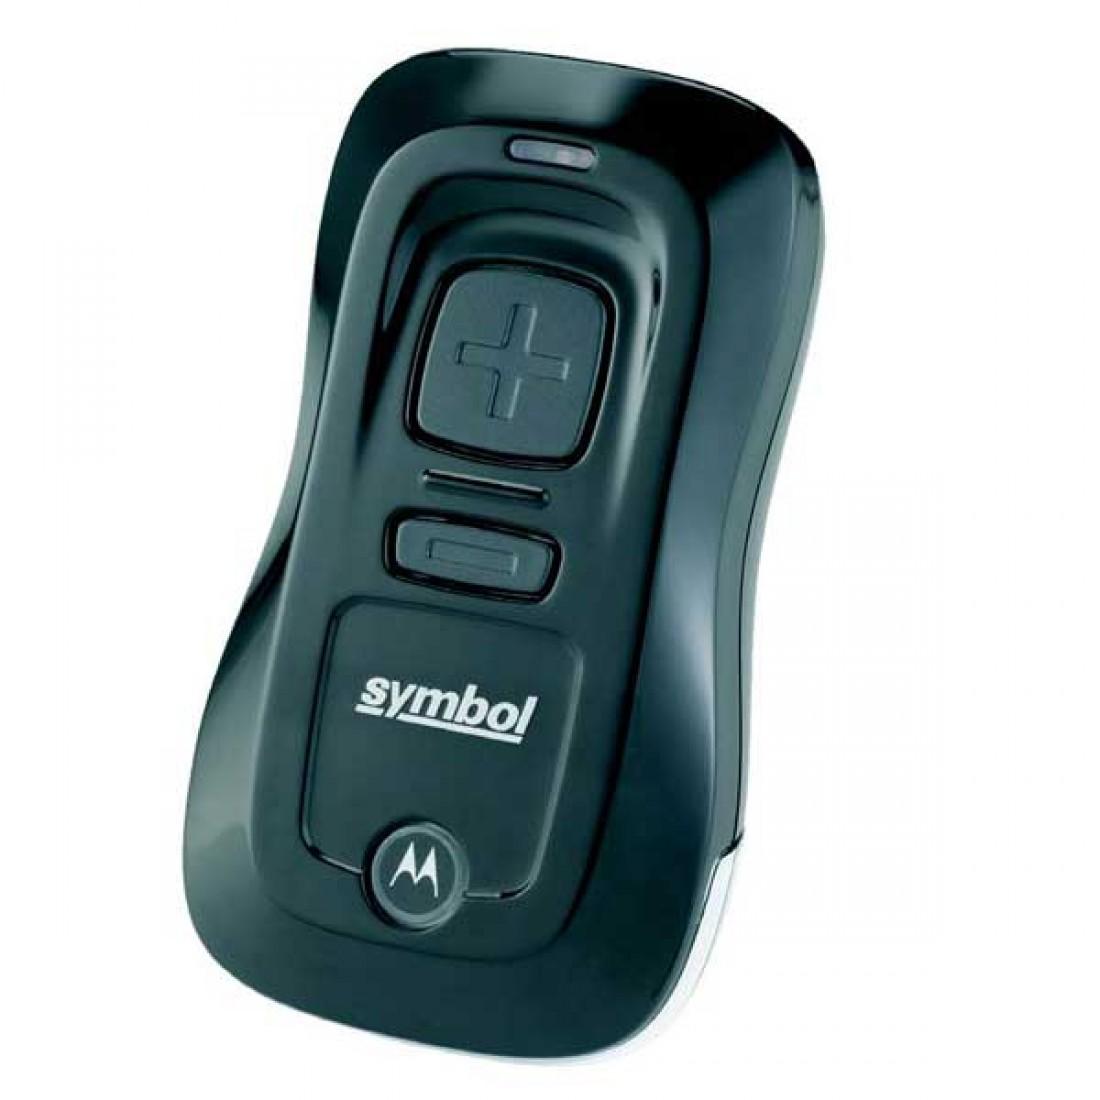 Zebra//Motorola Symbol DS9208/Hands-free 2D barcode scanner//Imager con cavo USB